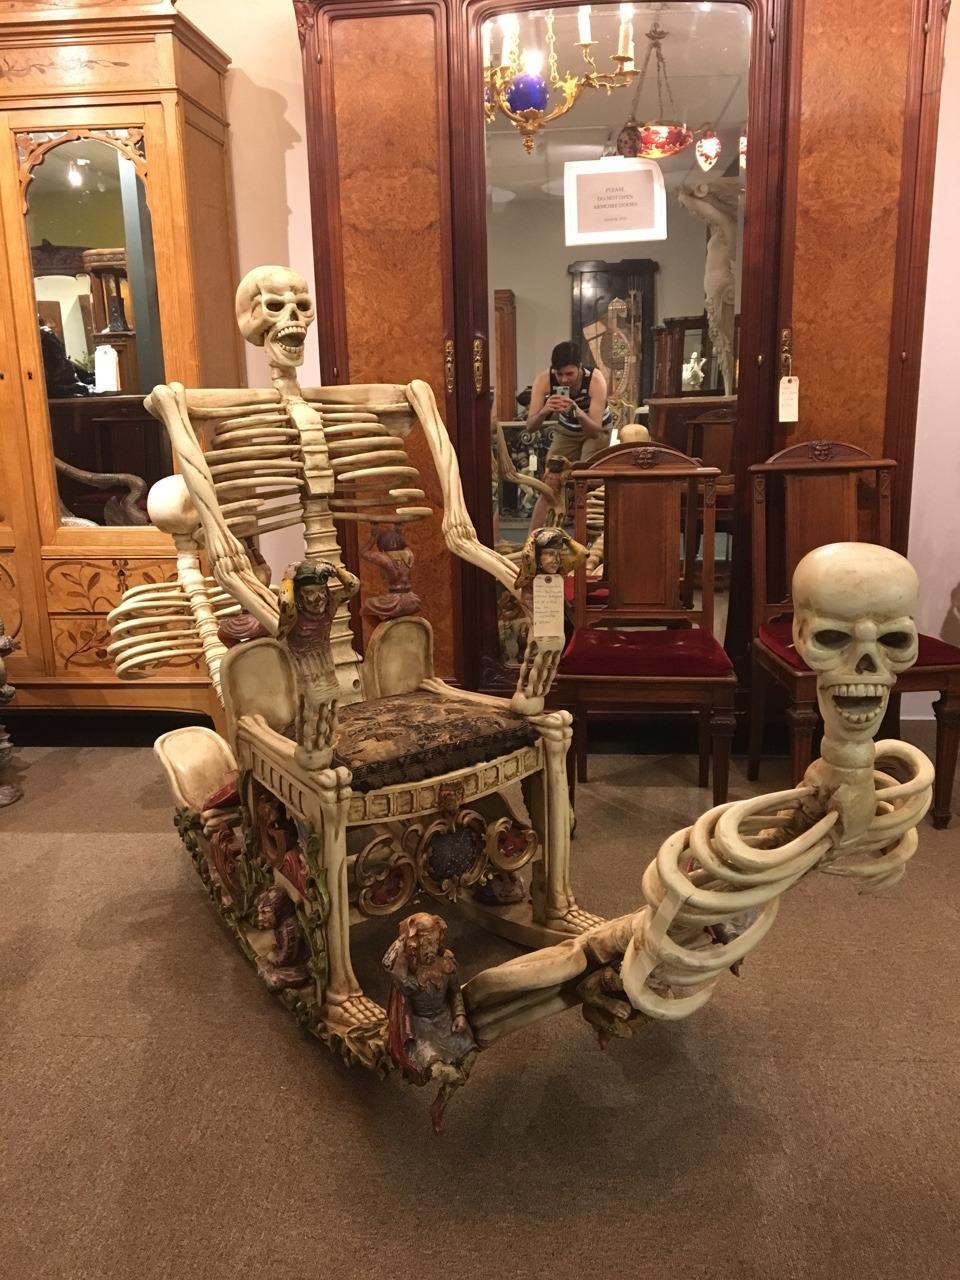 skeleton chair wake me up designer covers australia pty ltd weird antiques tumblr